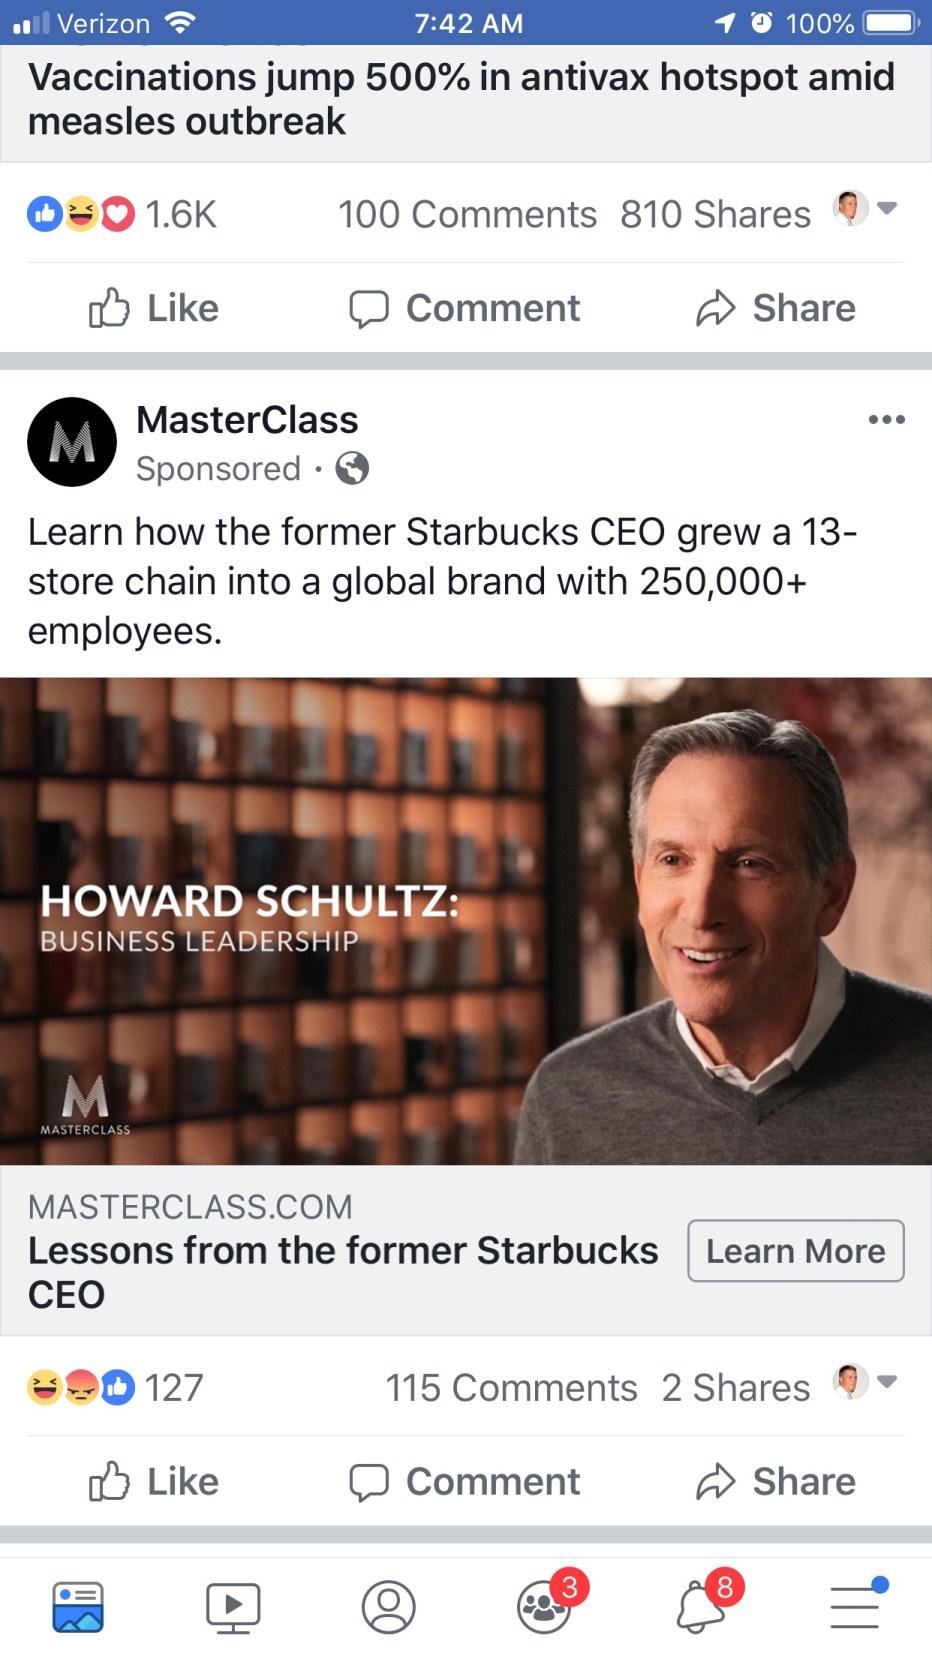 Howard Schultz MasterClass Facebook ad.